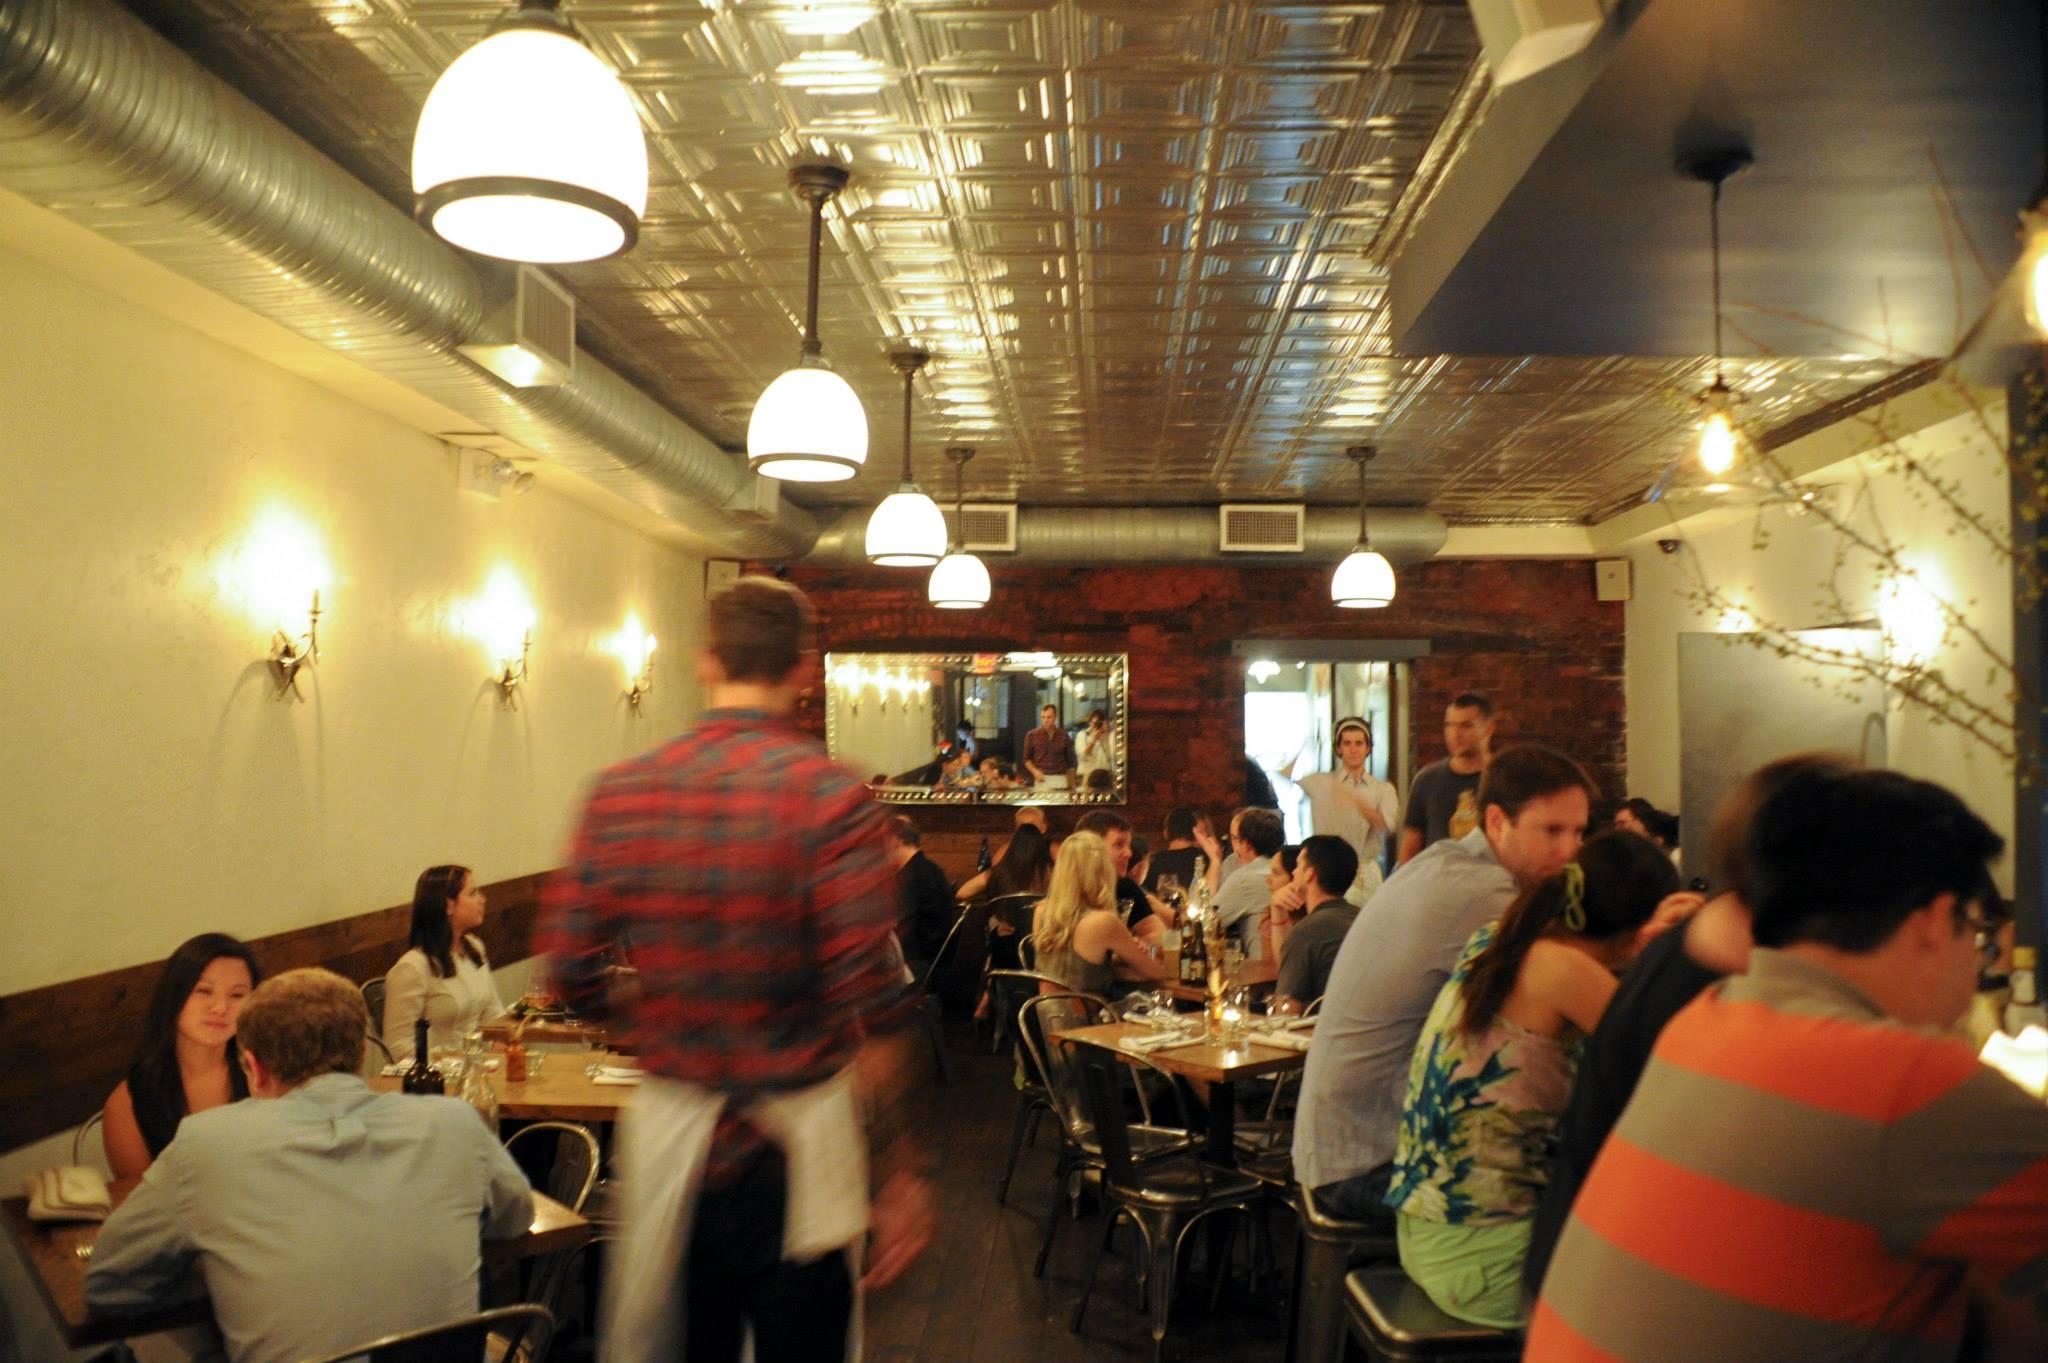 [The dining room at Resto]